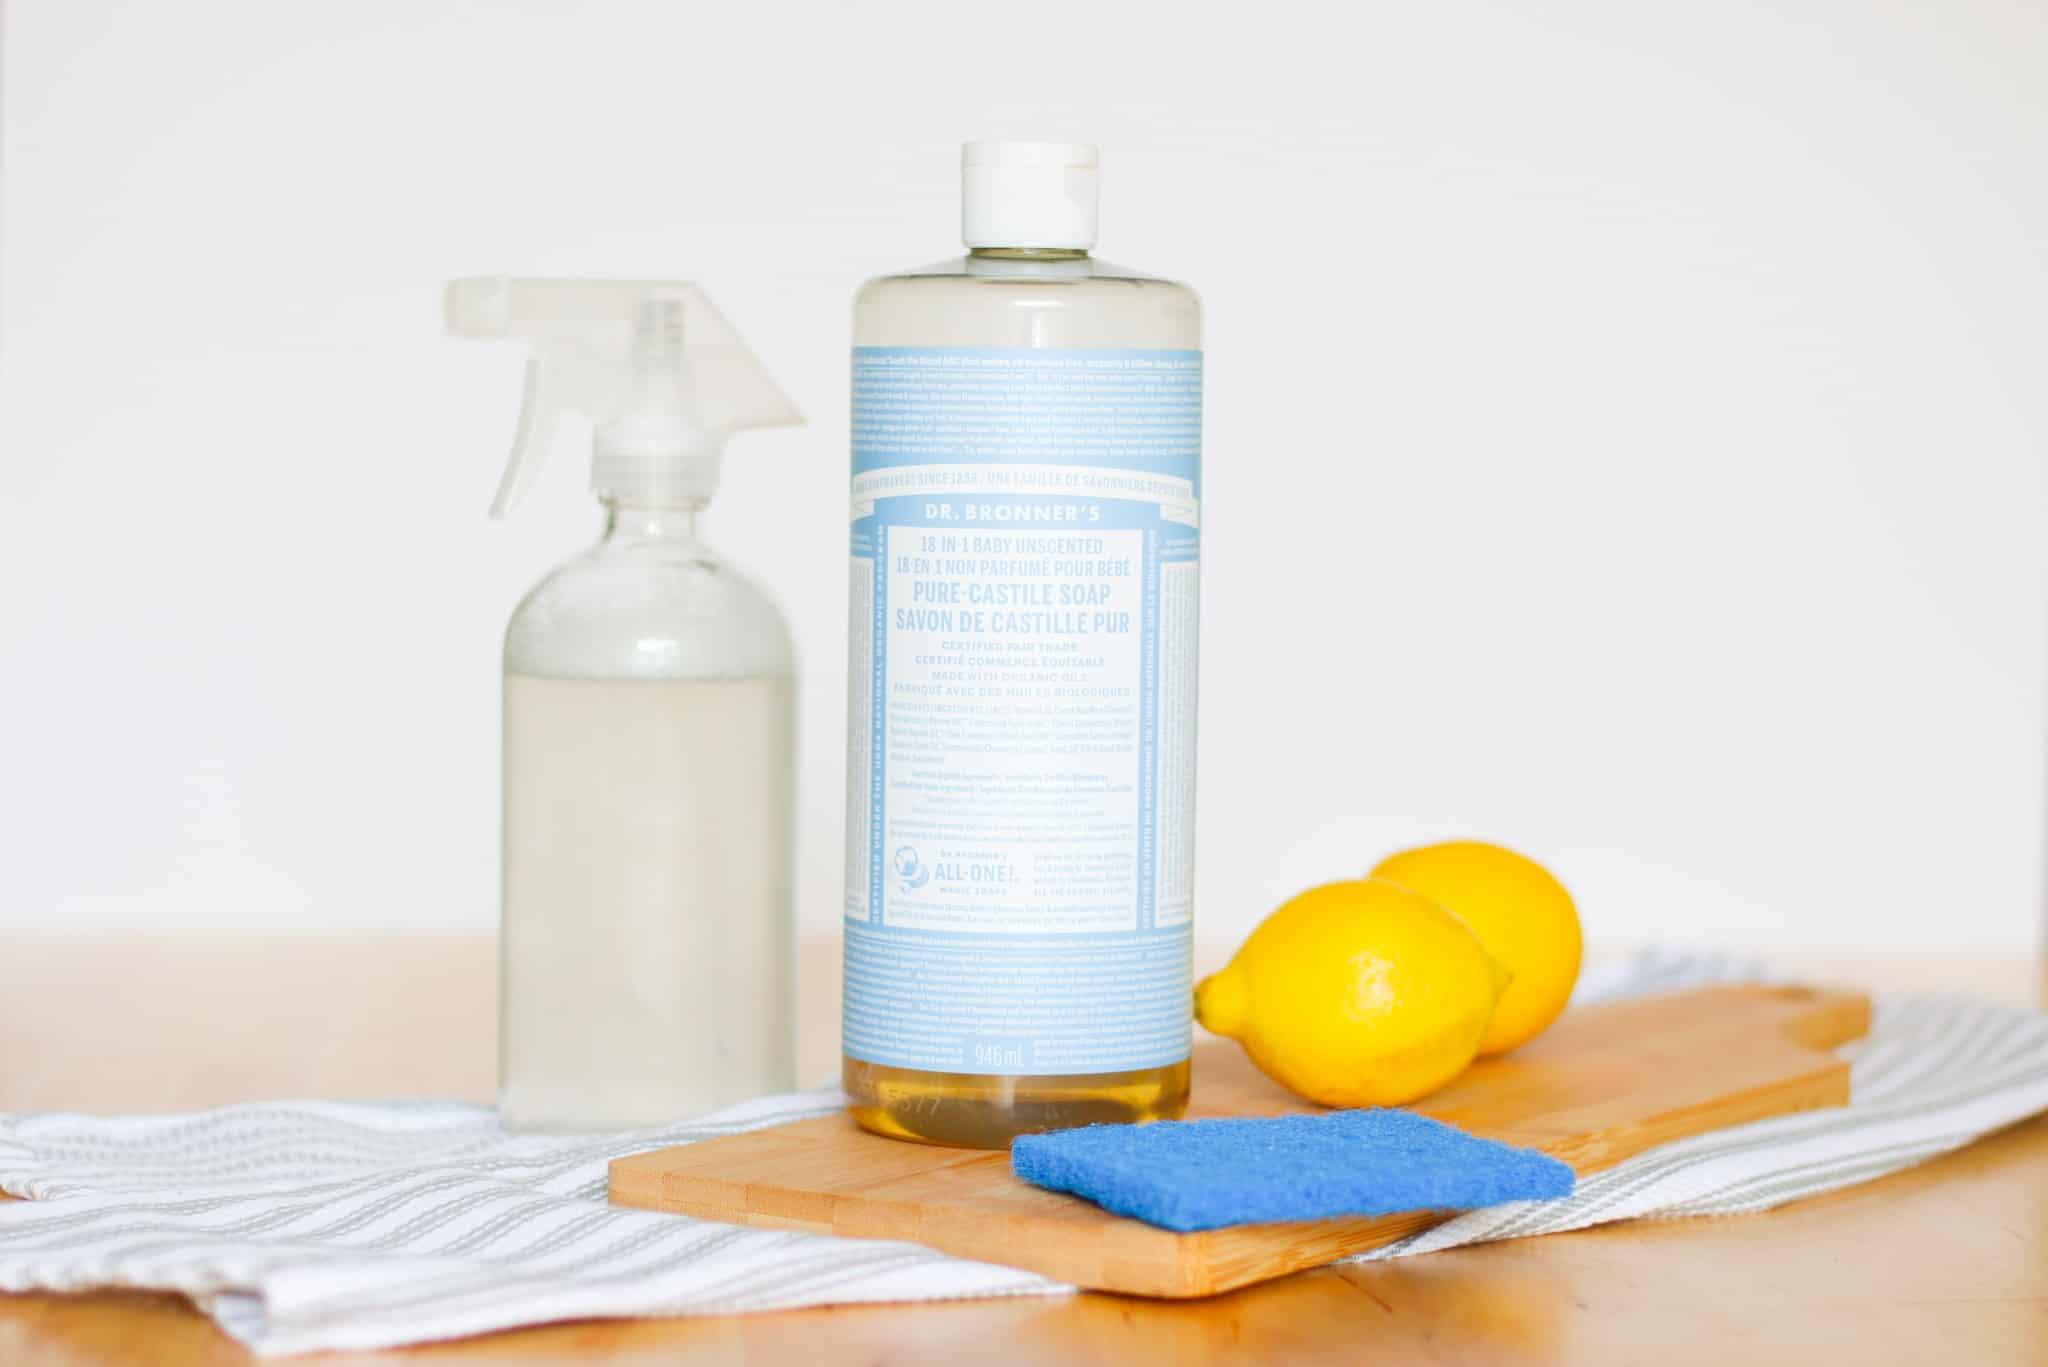 castile soap, spray bottle and scrubber